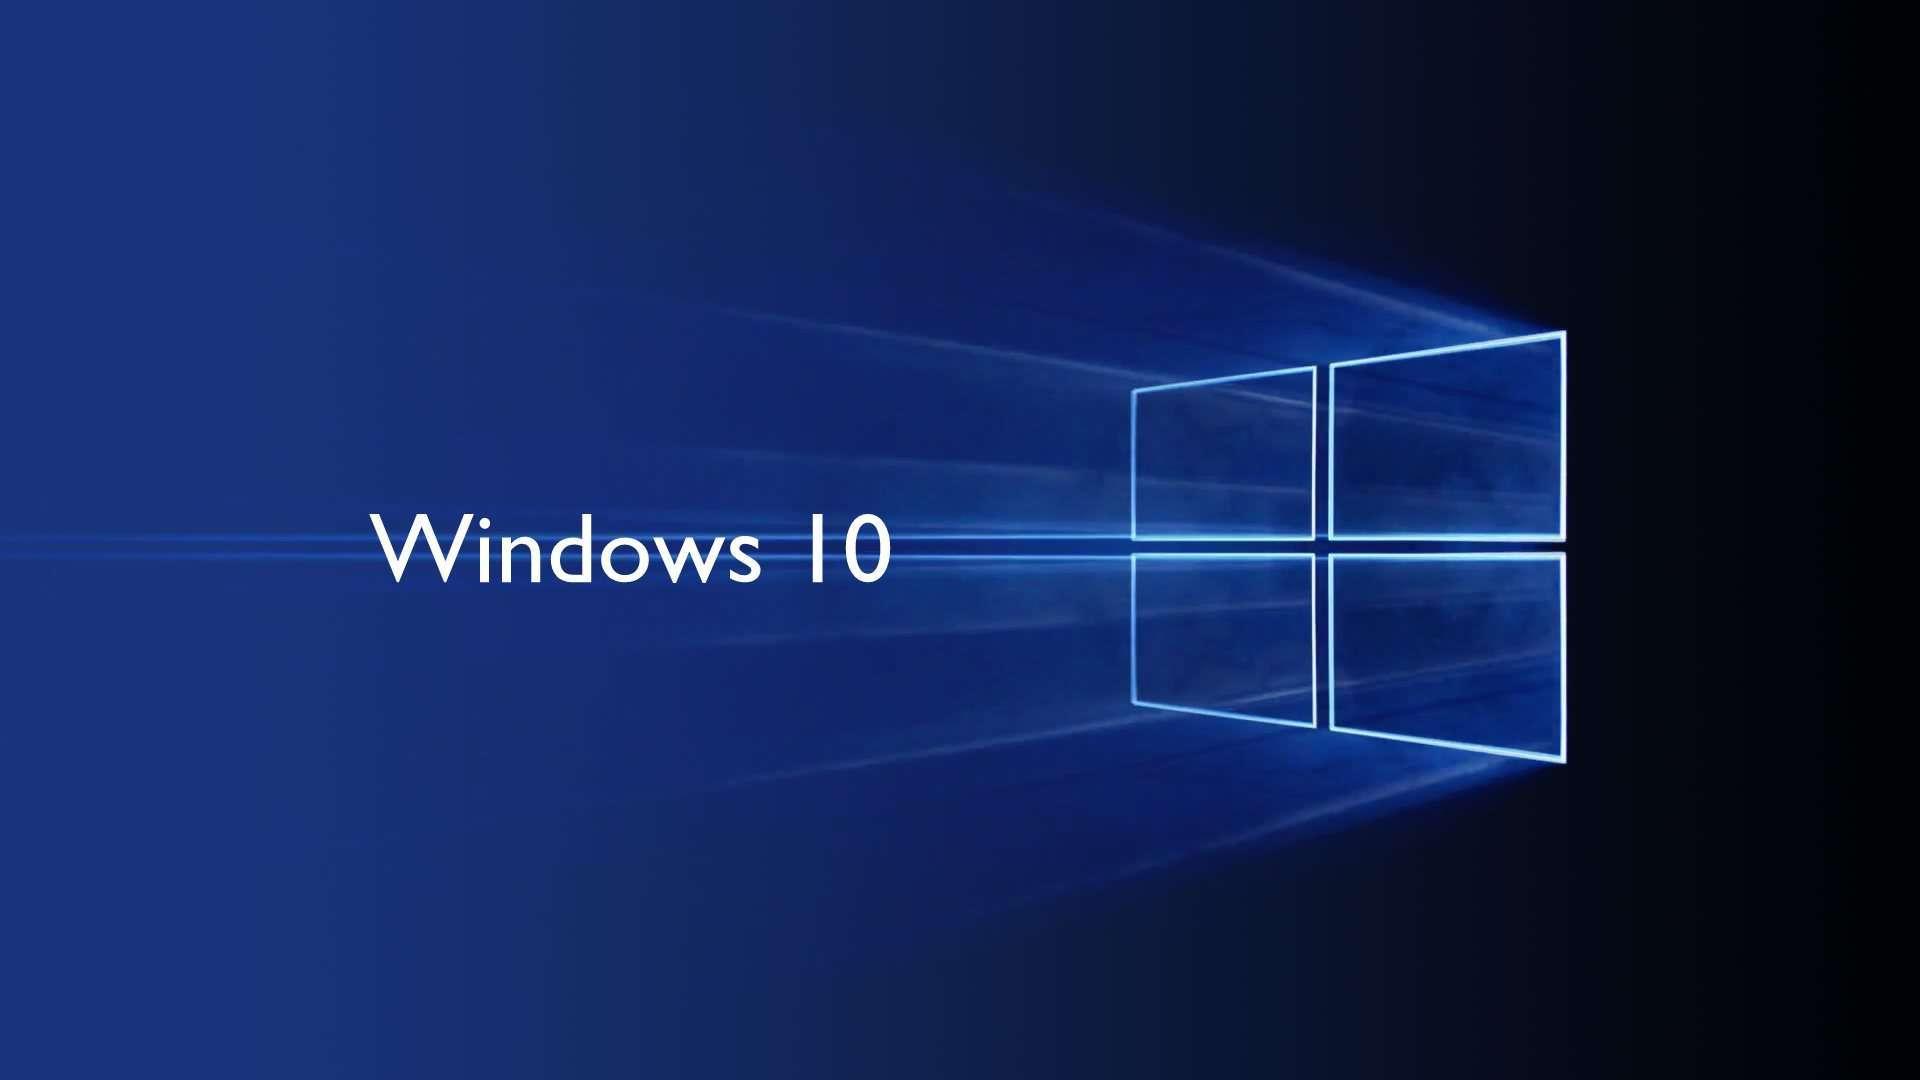 Wallpaper Windows 10 Hd Desktop 1080p Upload at August 1 2015 by 1920x1080